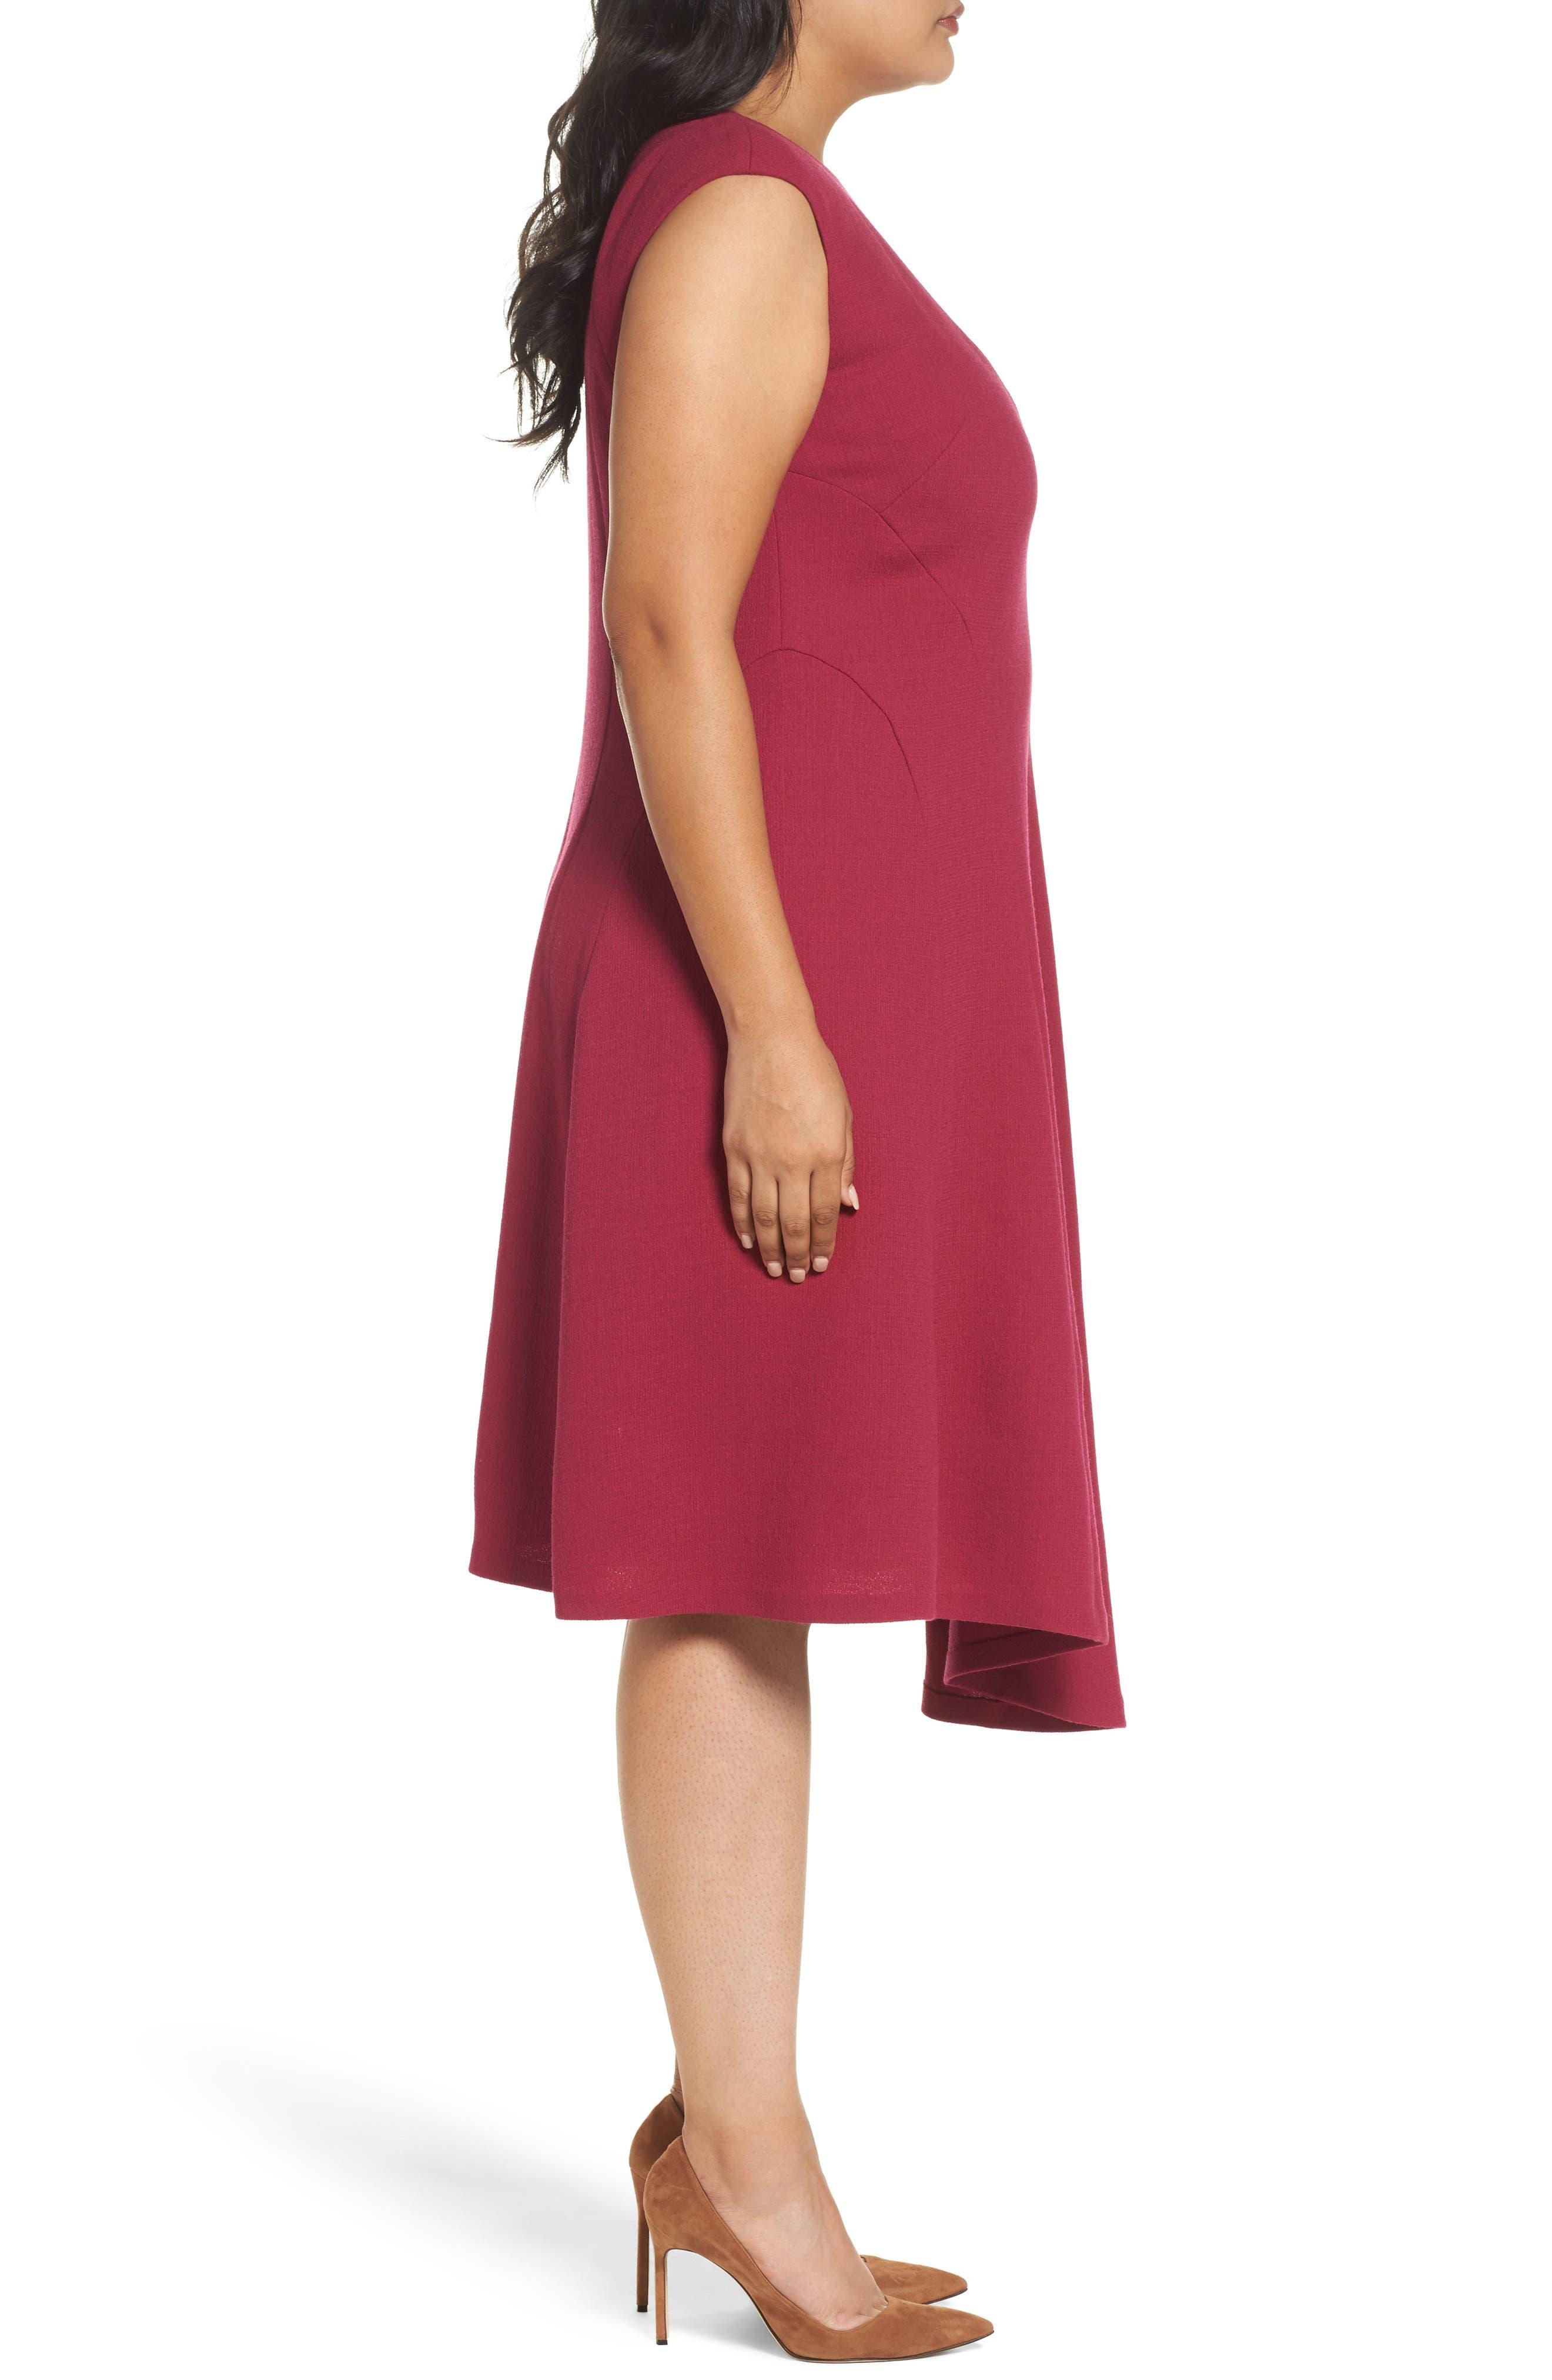 Aveena Wool Interlock Dress,                             Alternate thumbnail 3, color,                             651